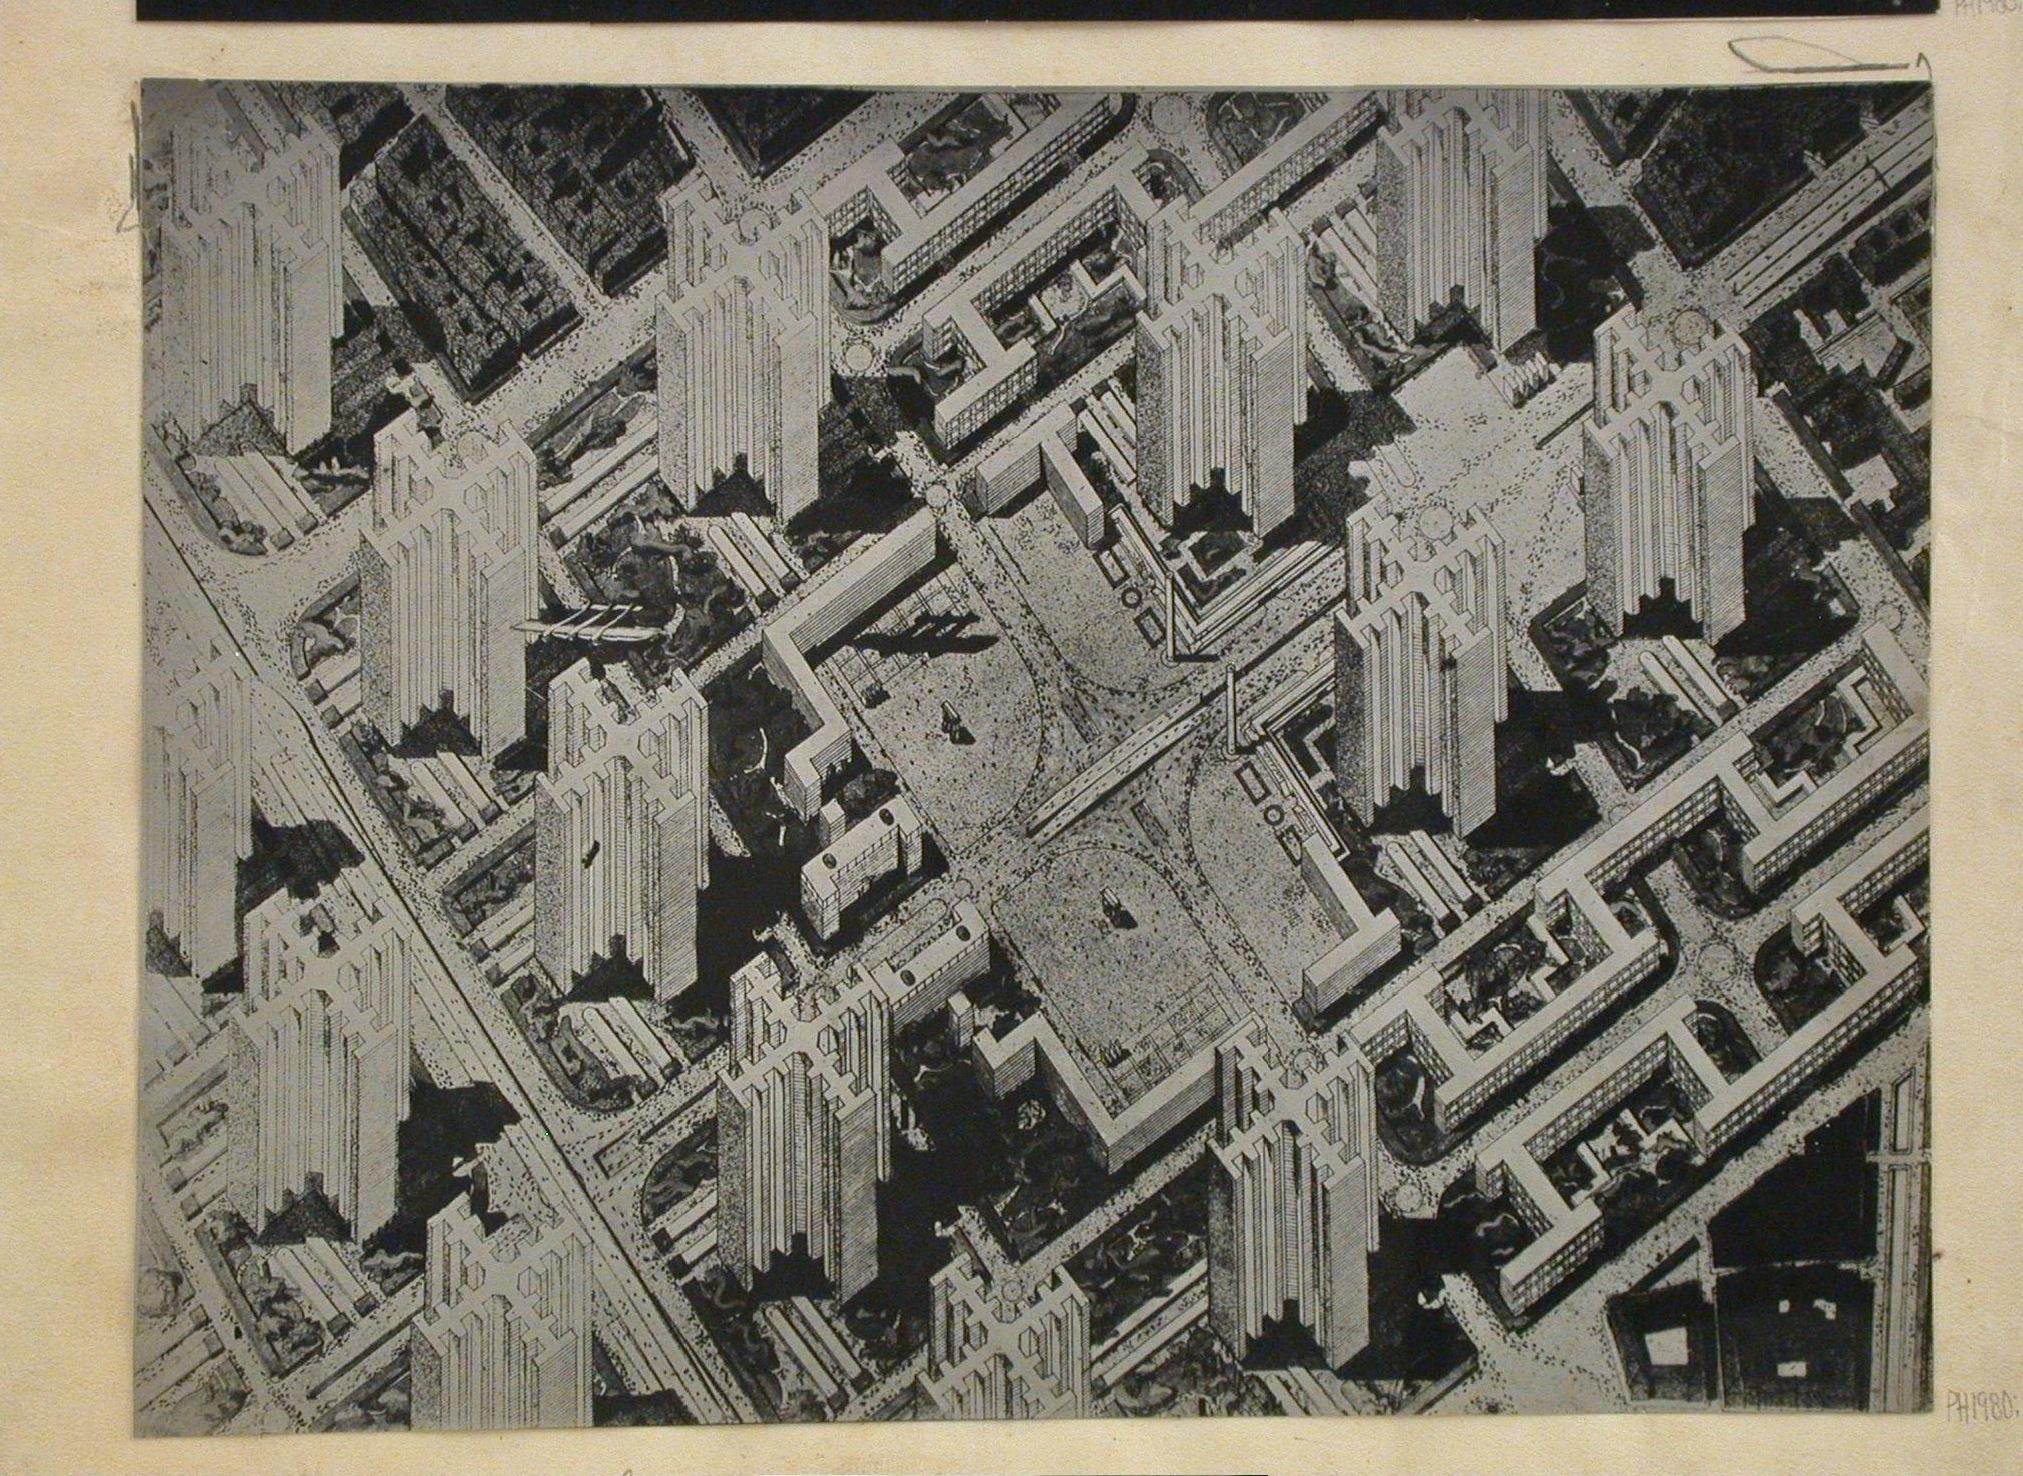 LE CORBUSIER CONTEMPORARY CITY PDF